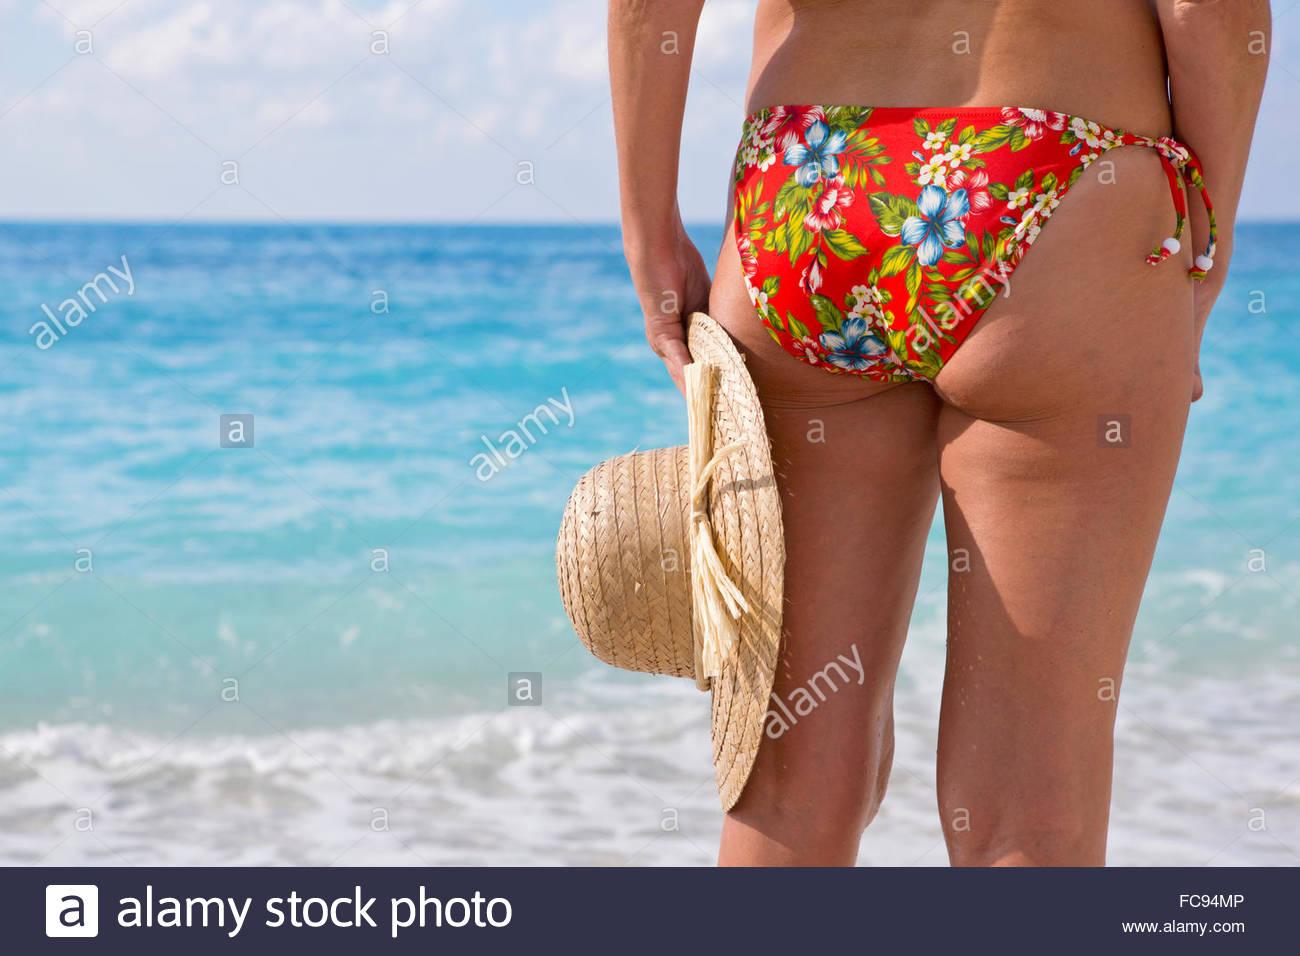 Close up woman in bikini holding sun hat at ocean - Stock Image